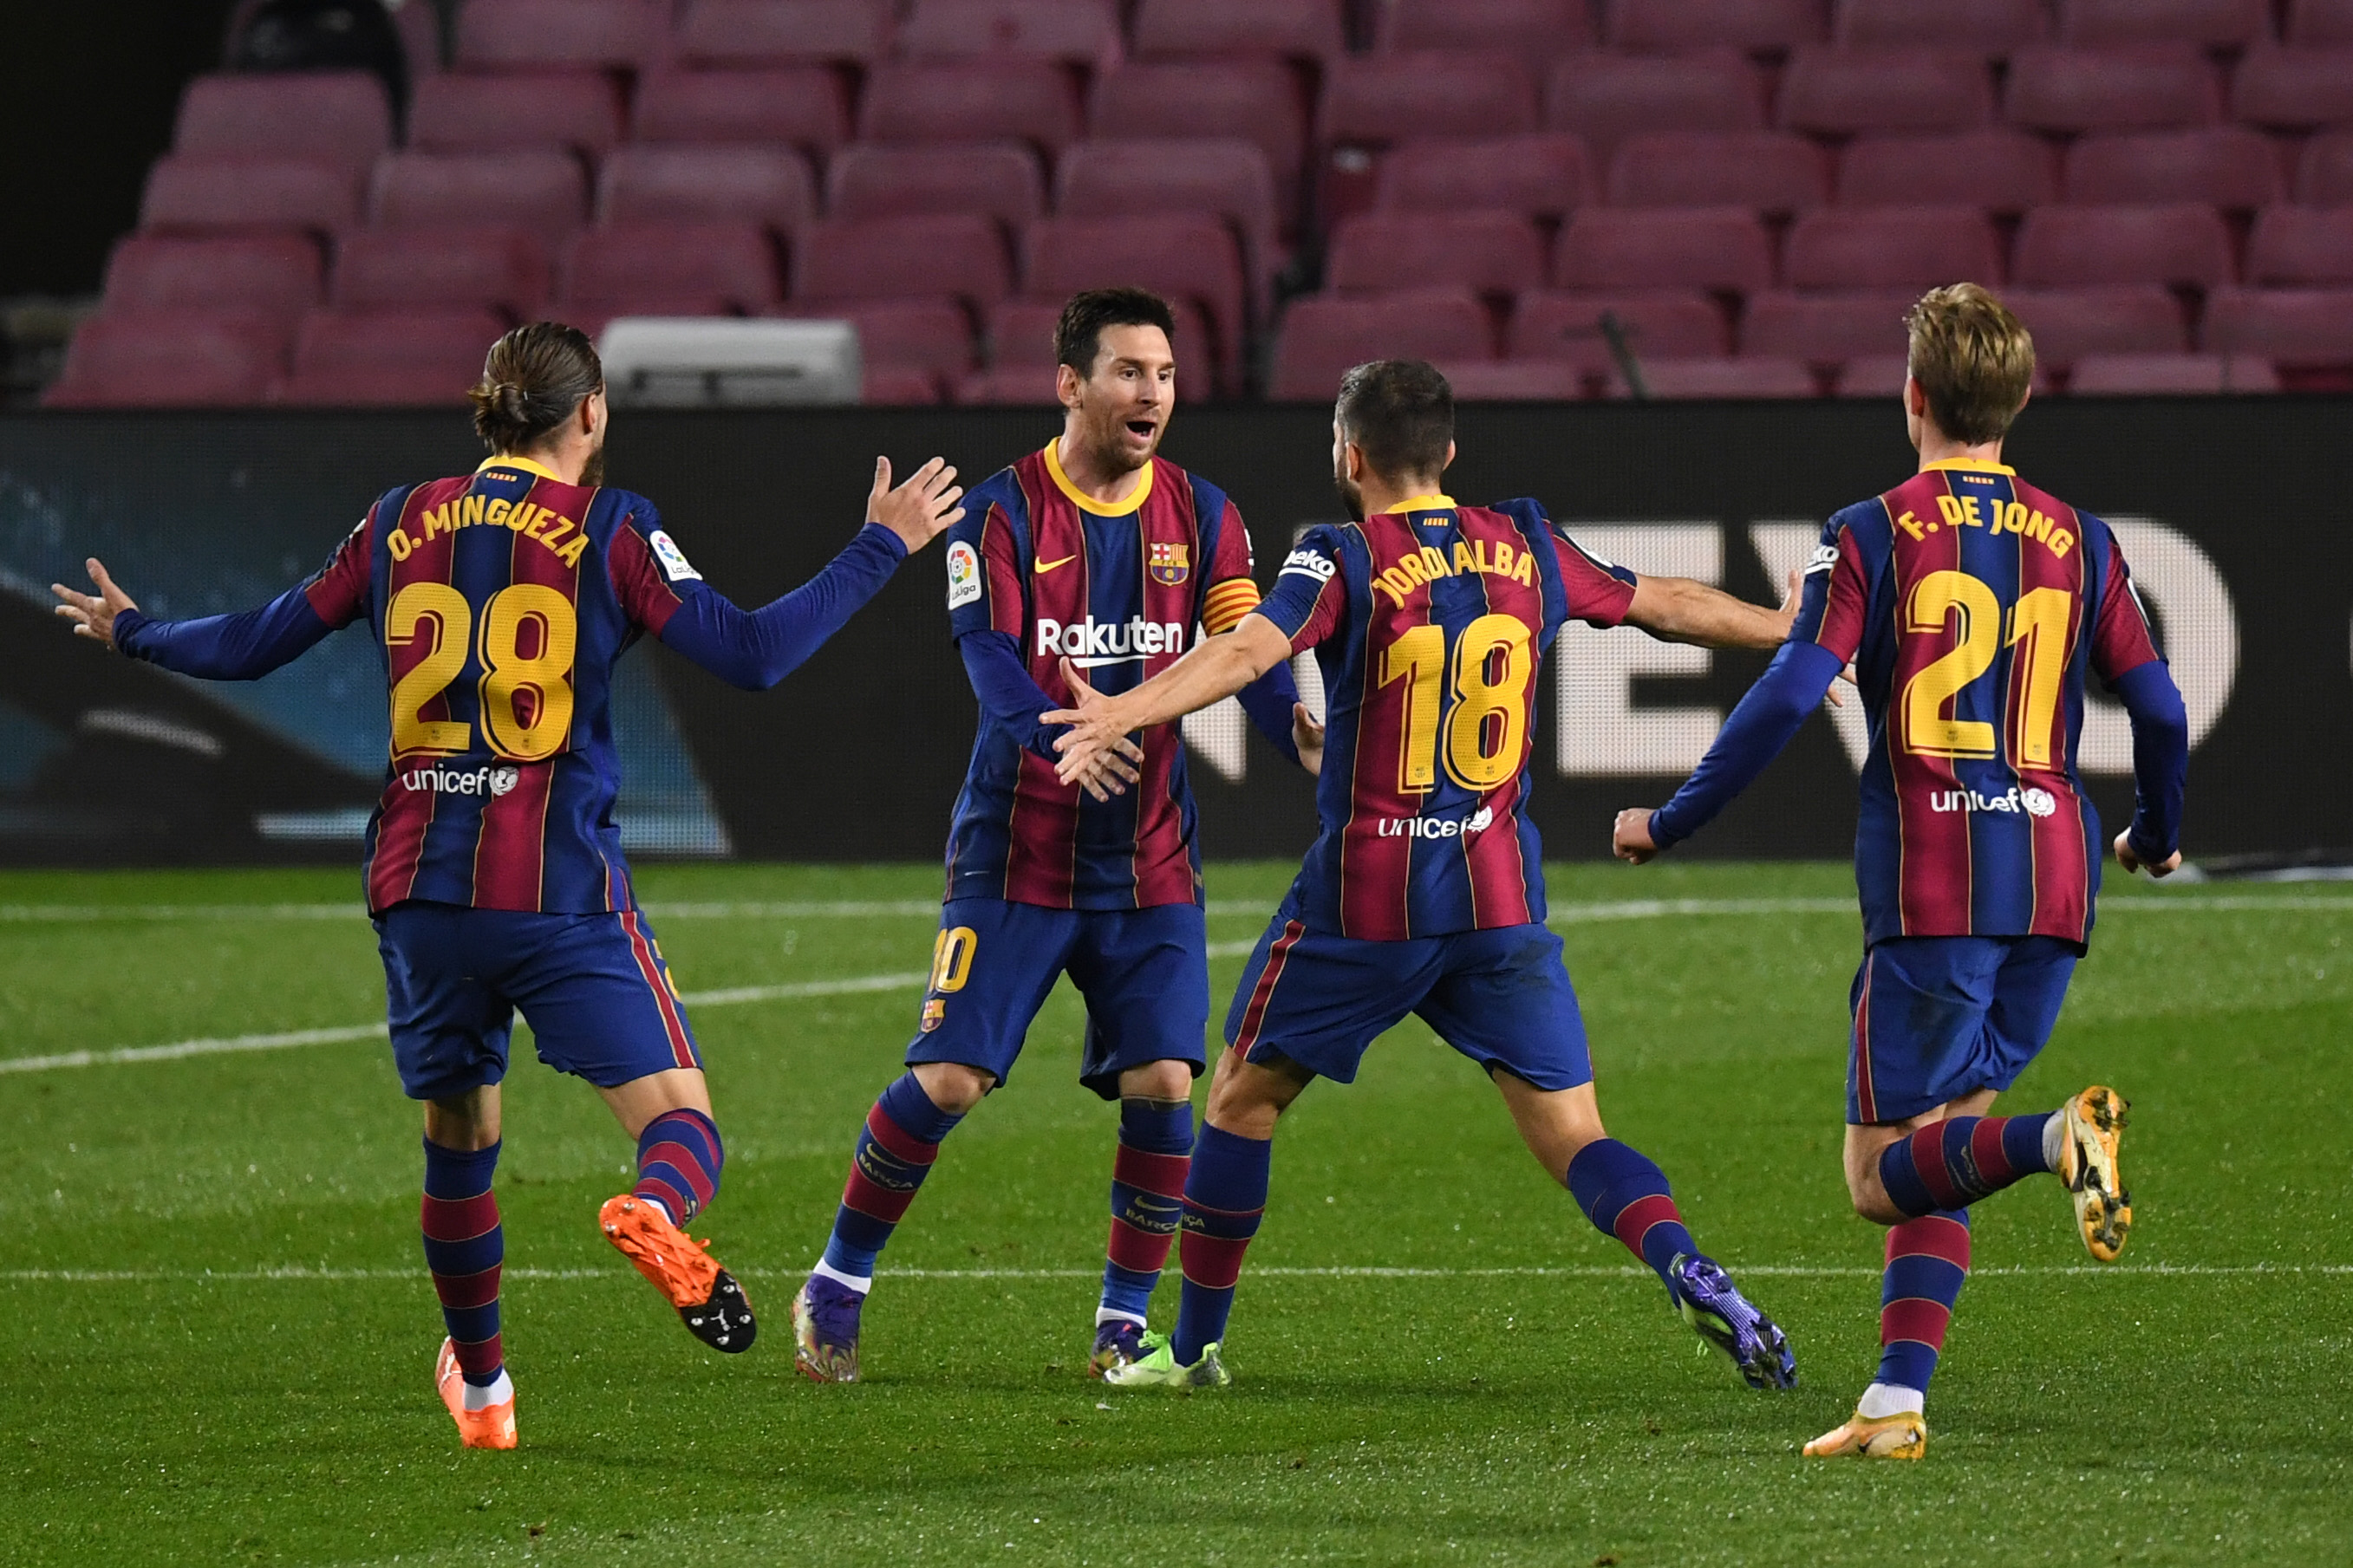 How To Watch Real Betis Vs Barcelona La Liga 2 7 Channel Live Stream Time Mlive Com